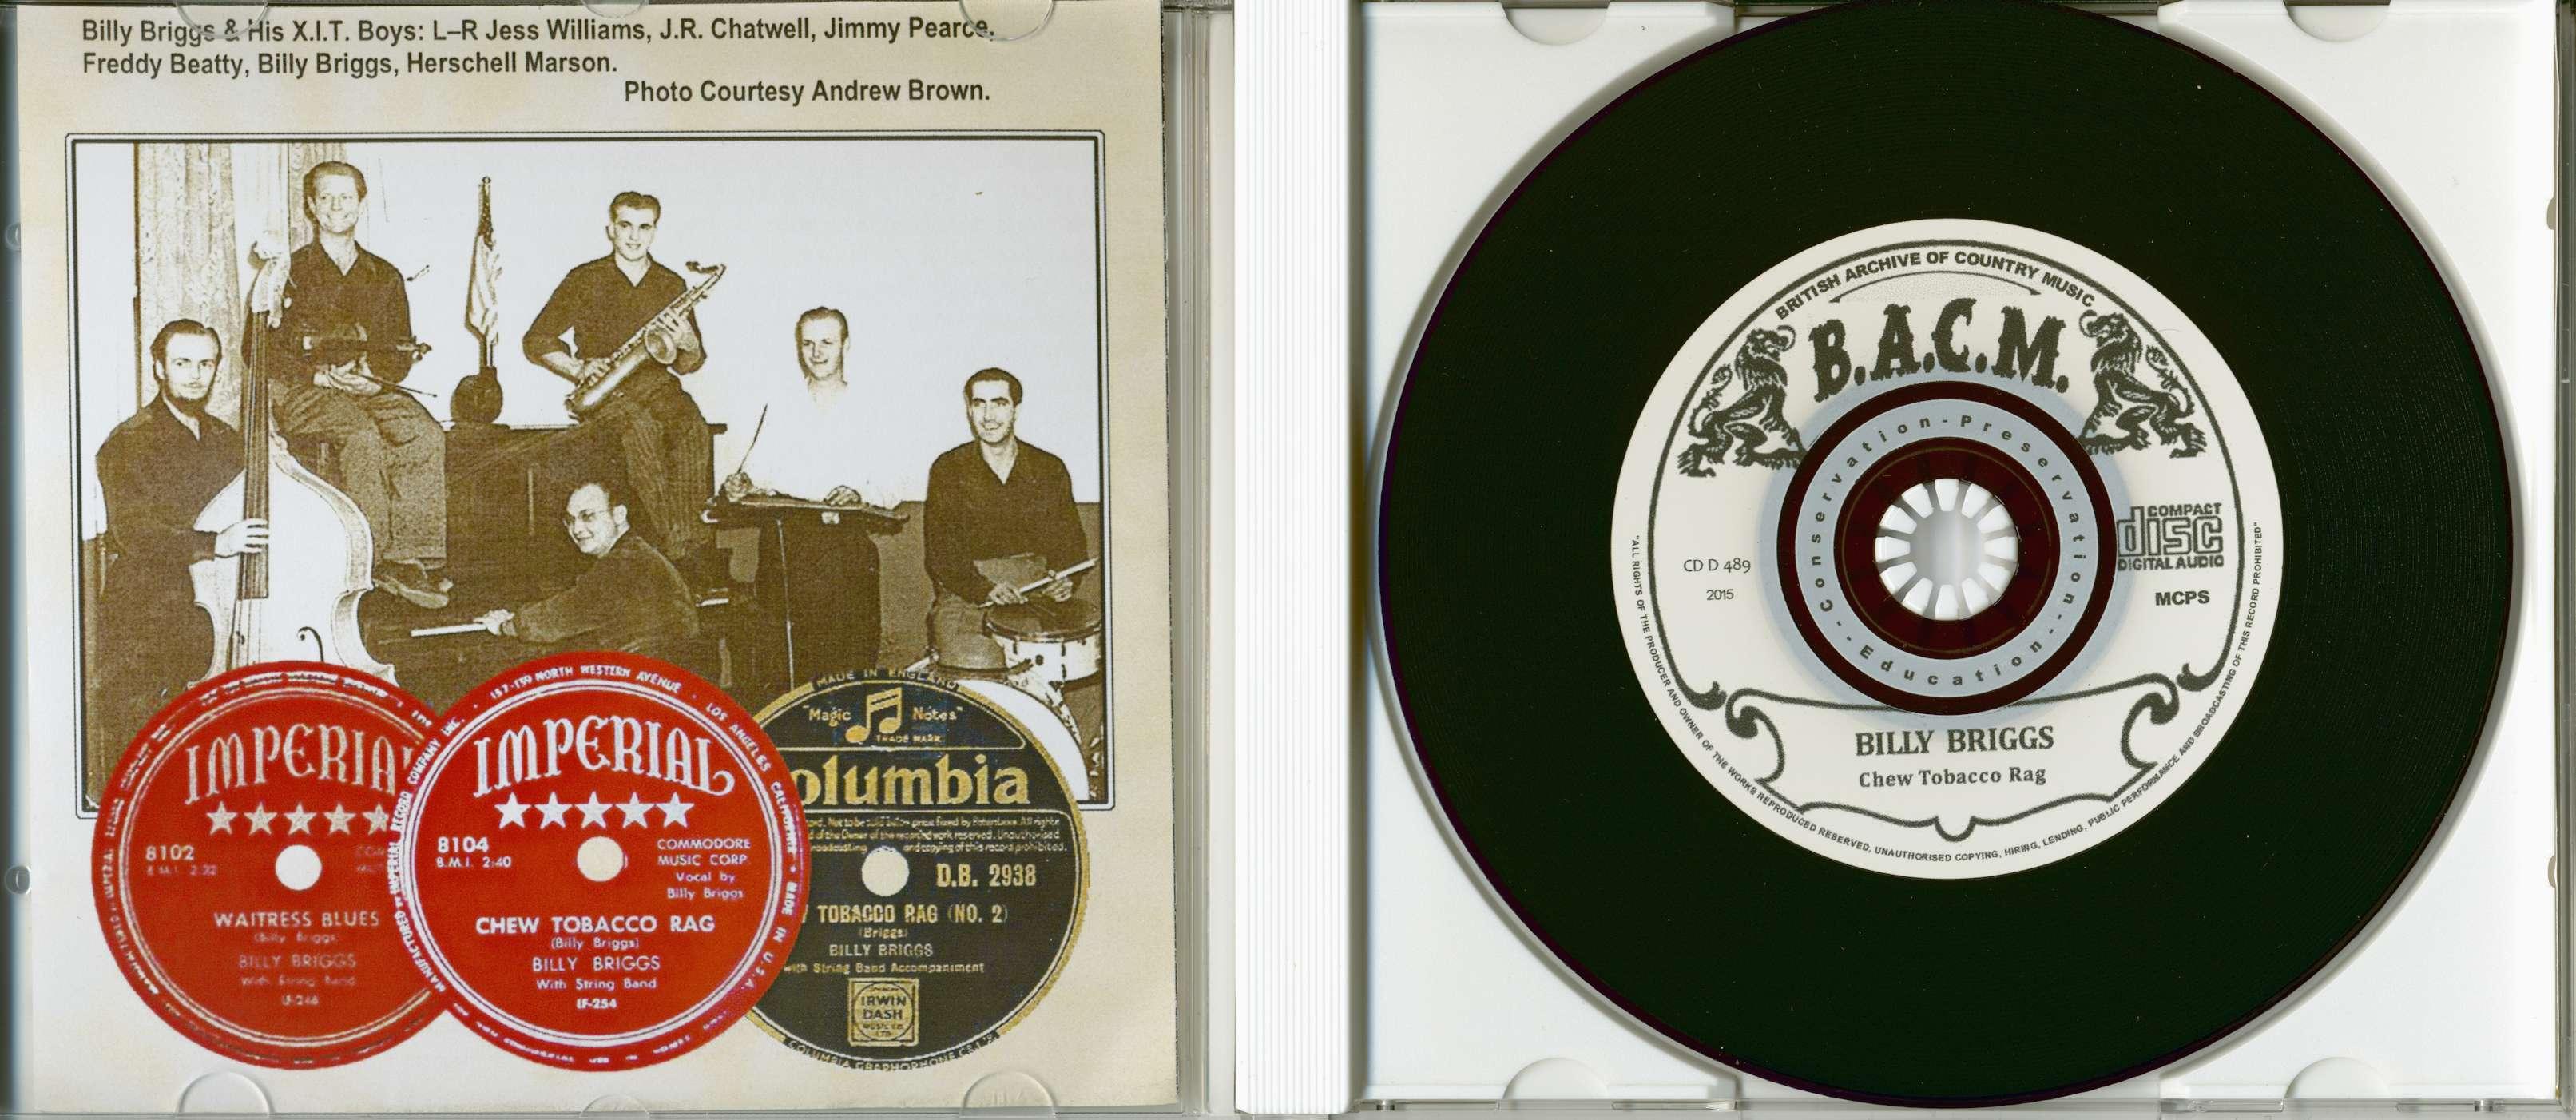 Billy Briggs CD: Chew Tobacco Rag - Bear Family Records